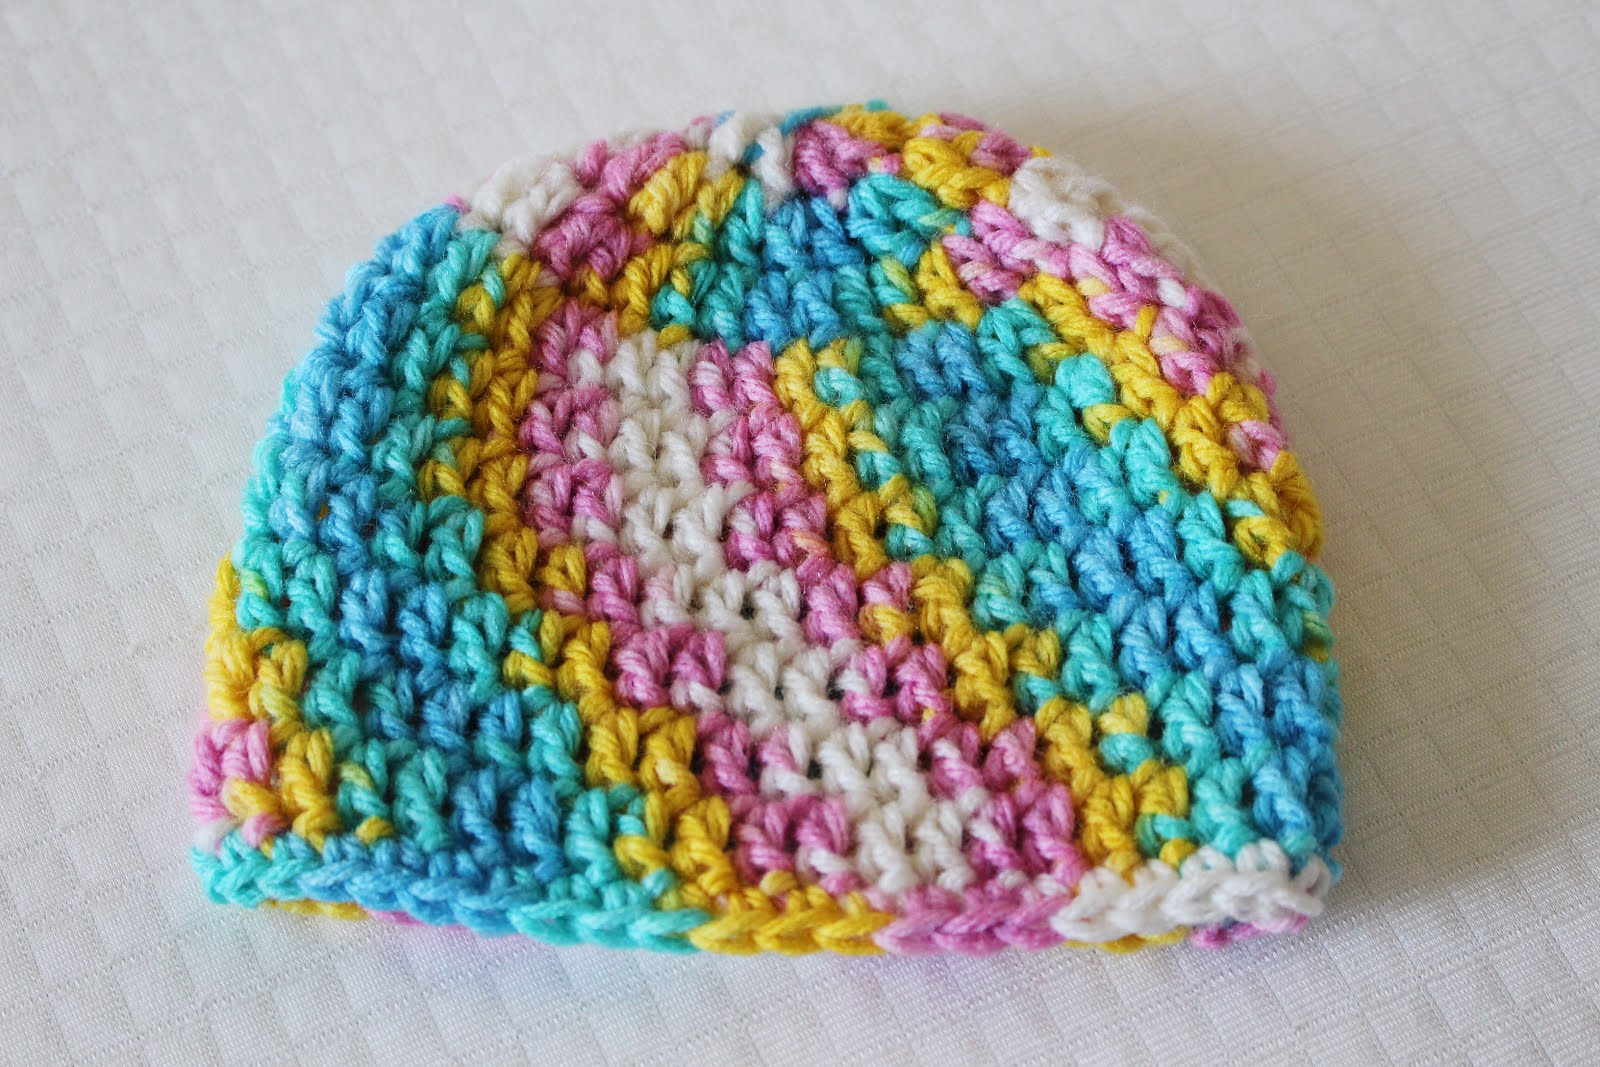 Big Twist Yarn Patterns Unique Inspiration